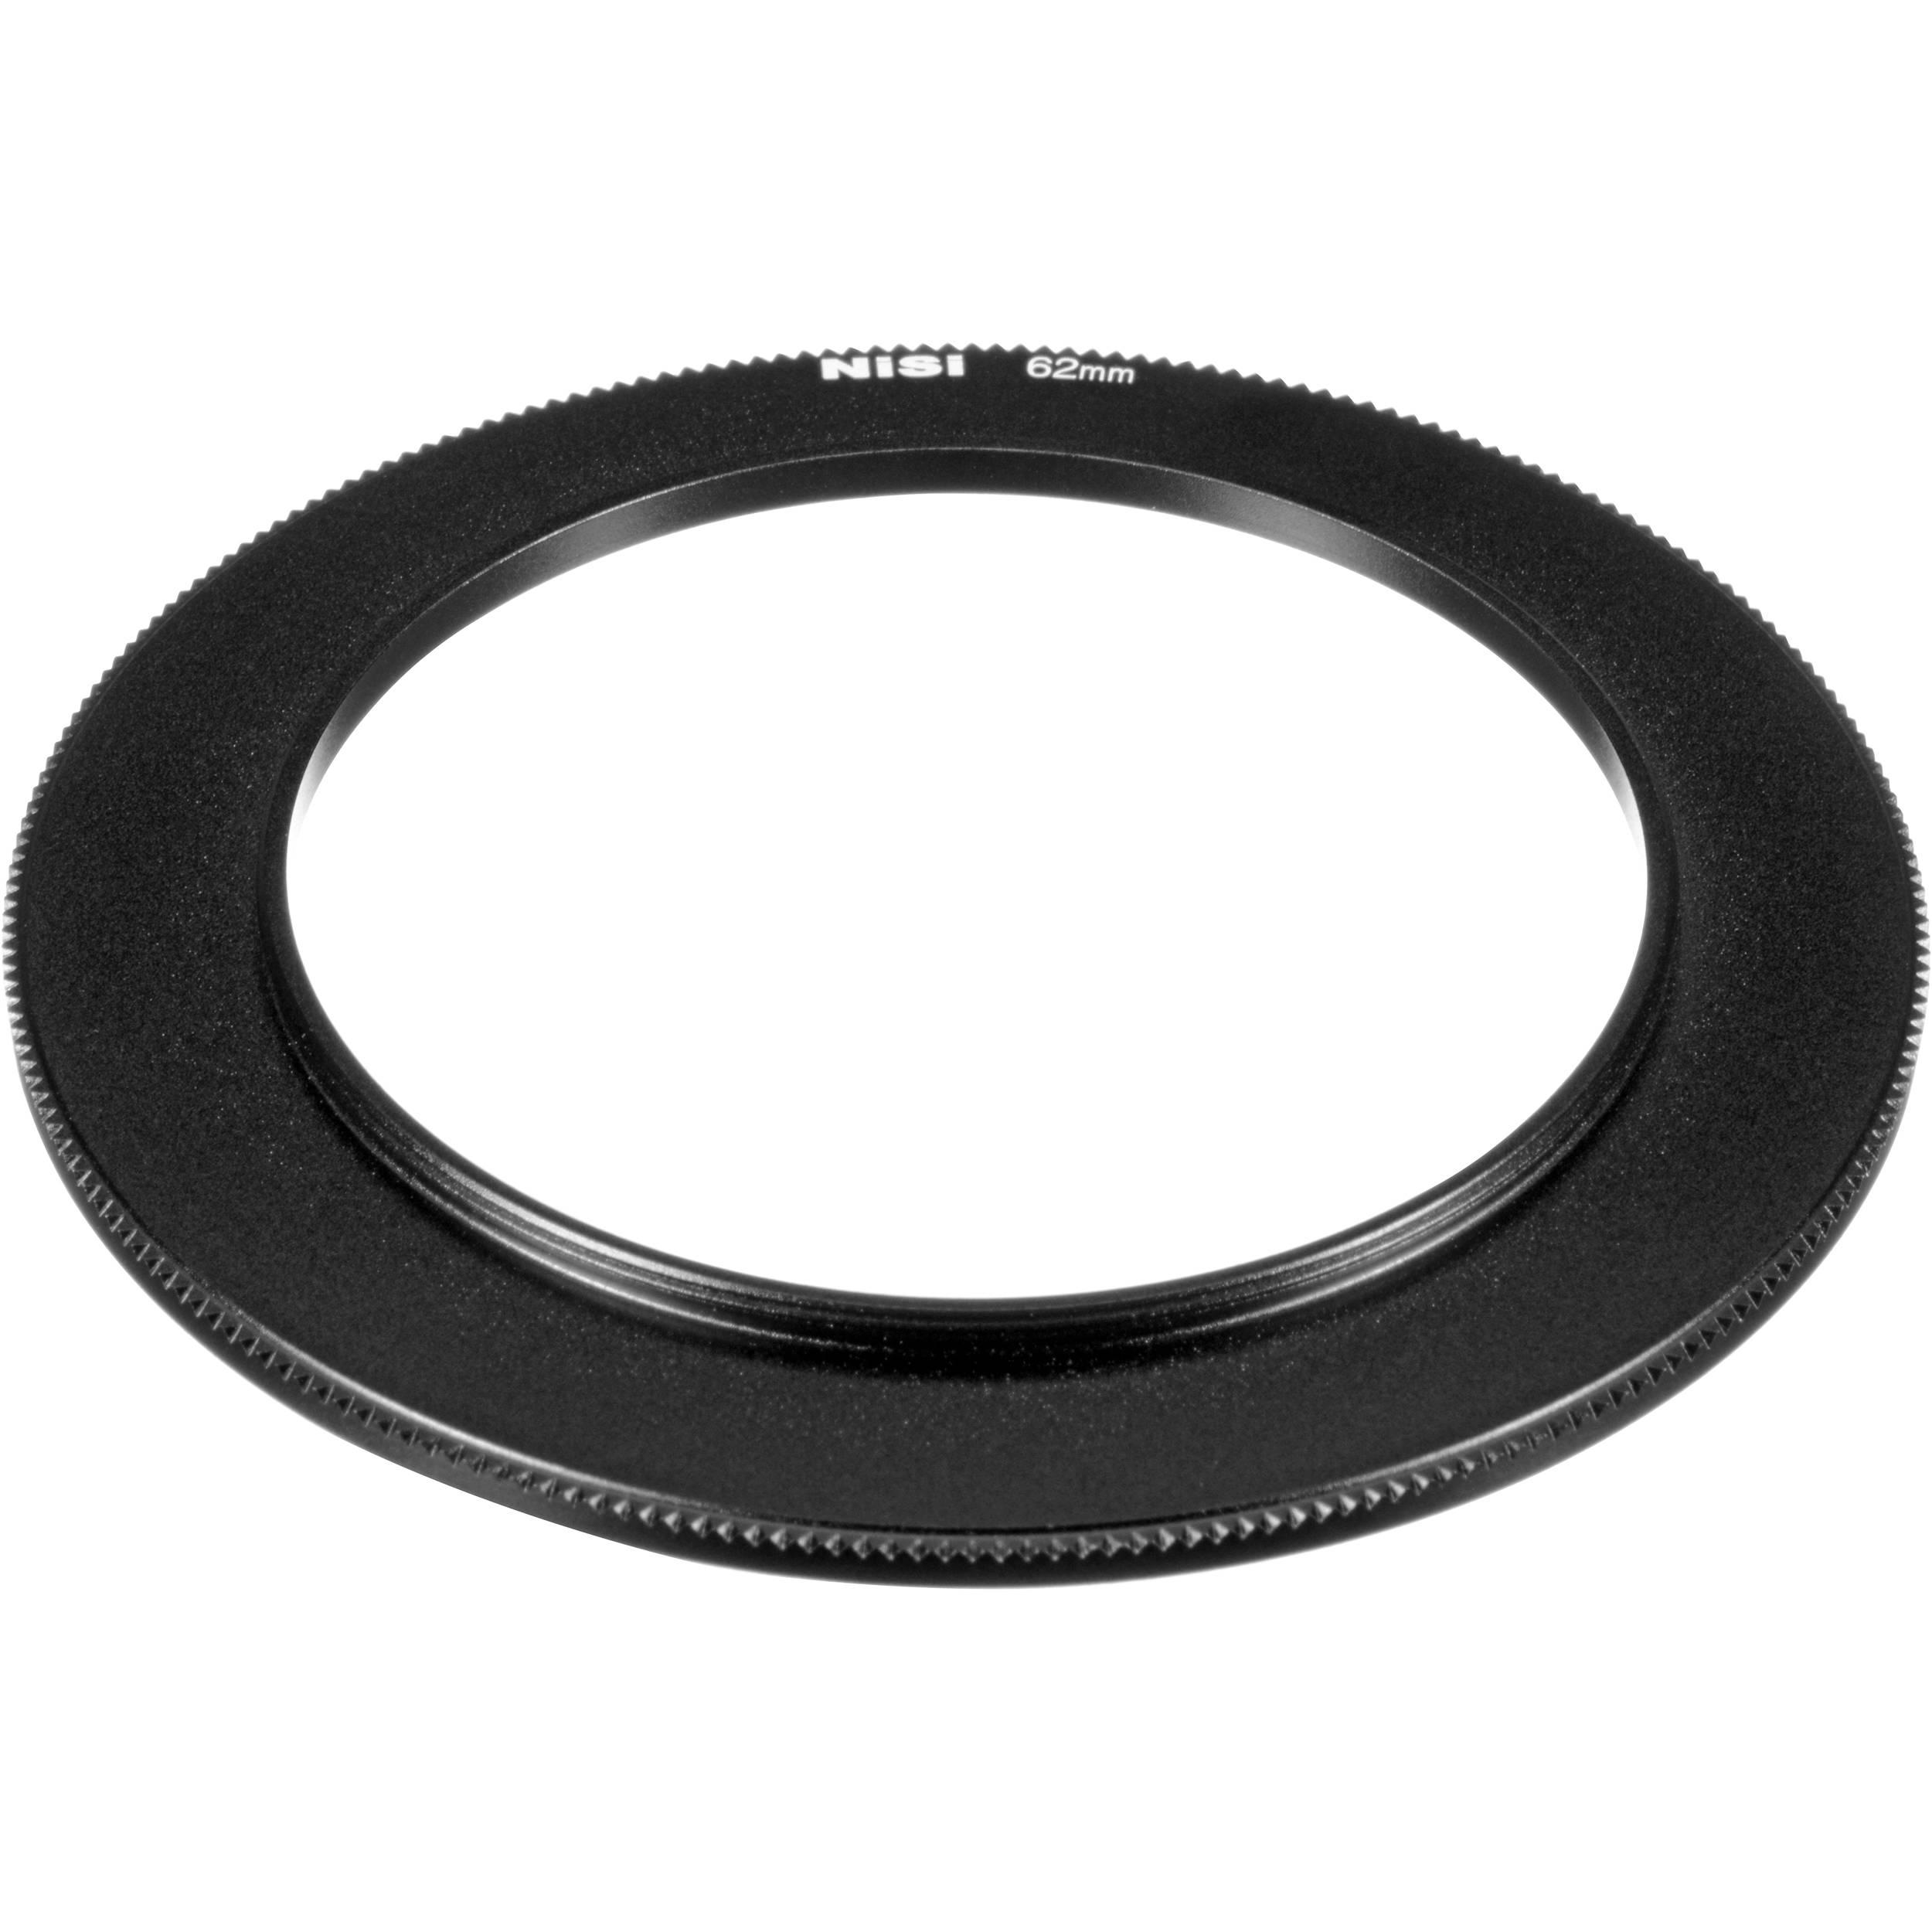 NiSi PRO 62-72mm Aluminum Step-Up Ring